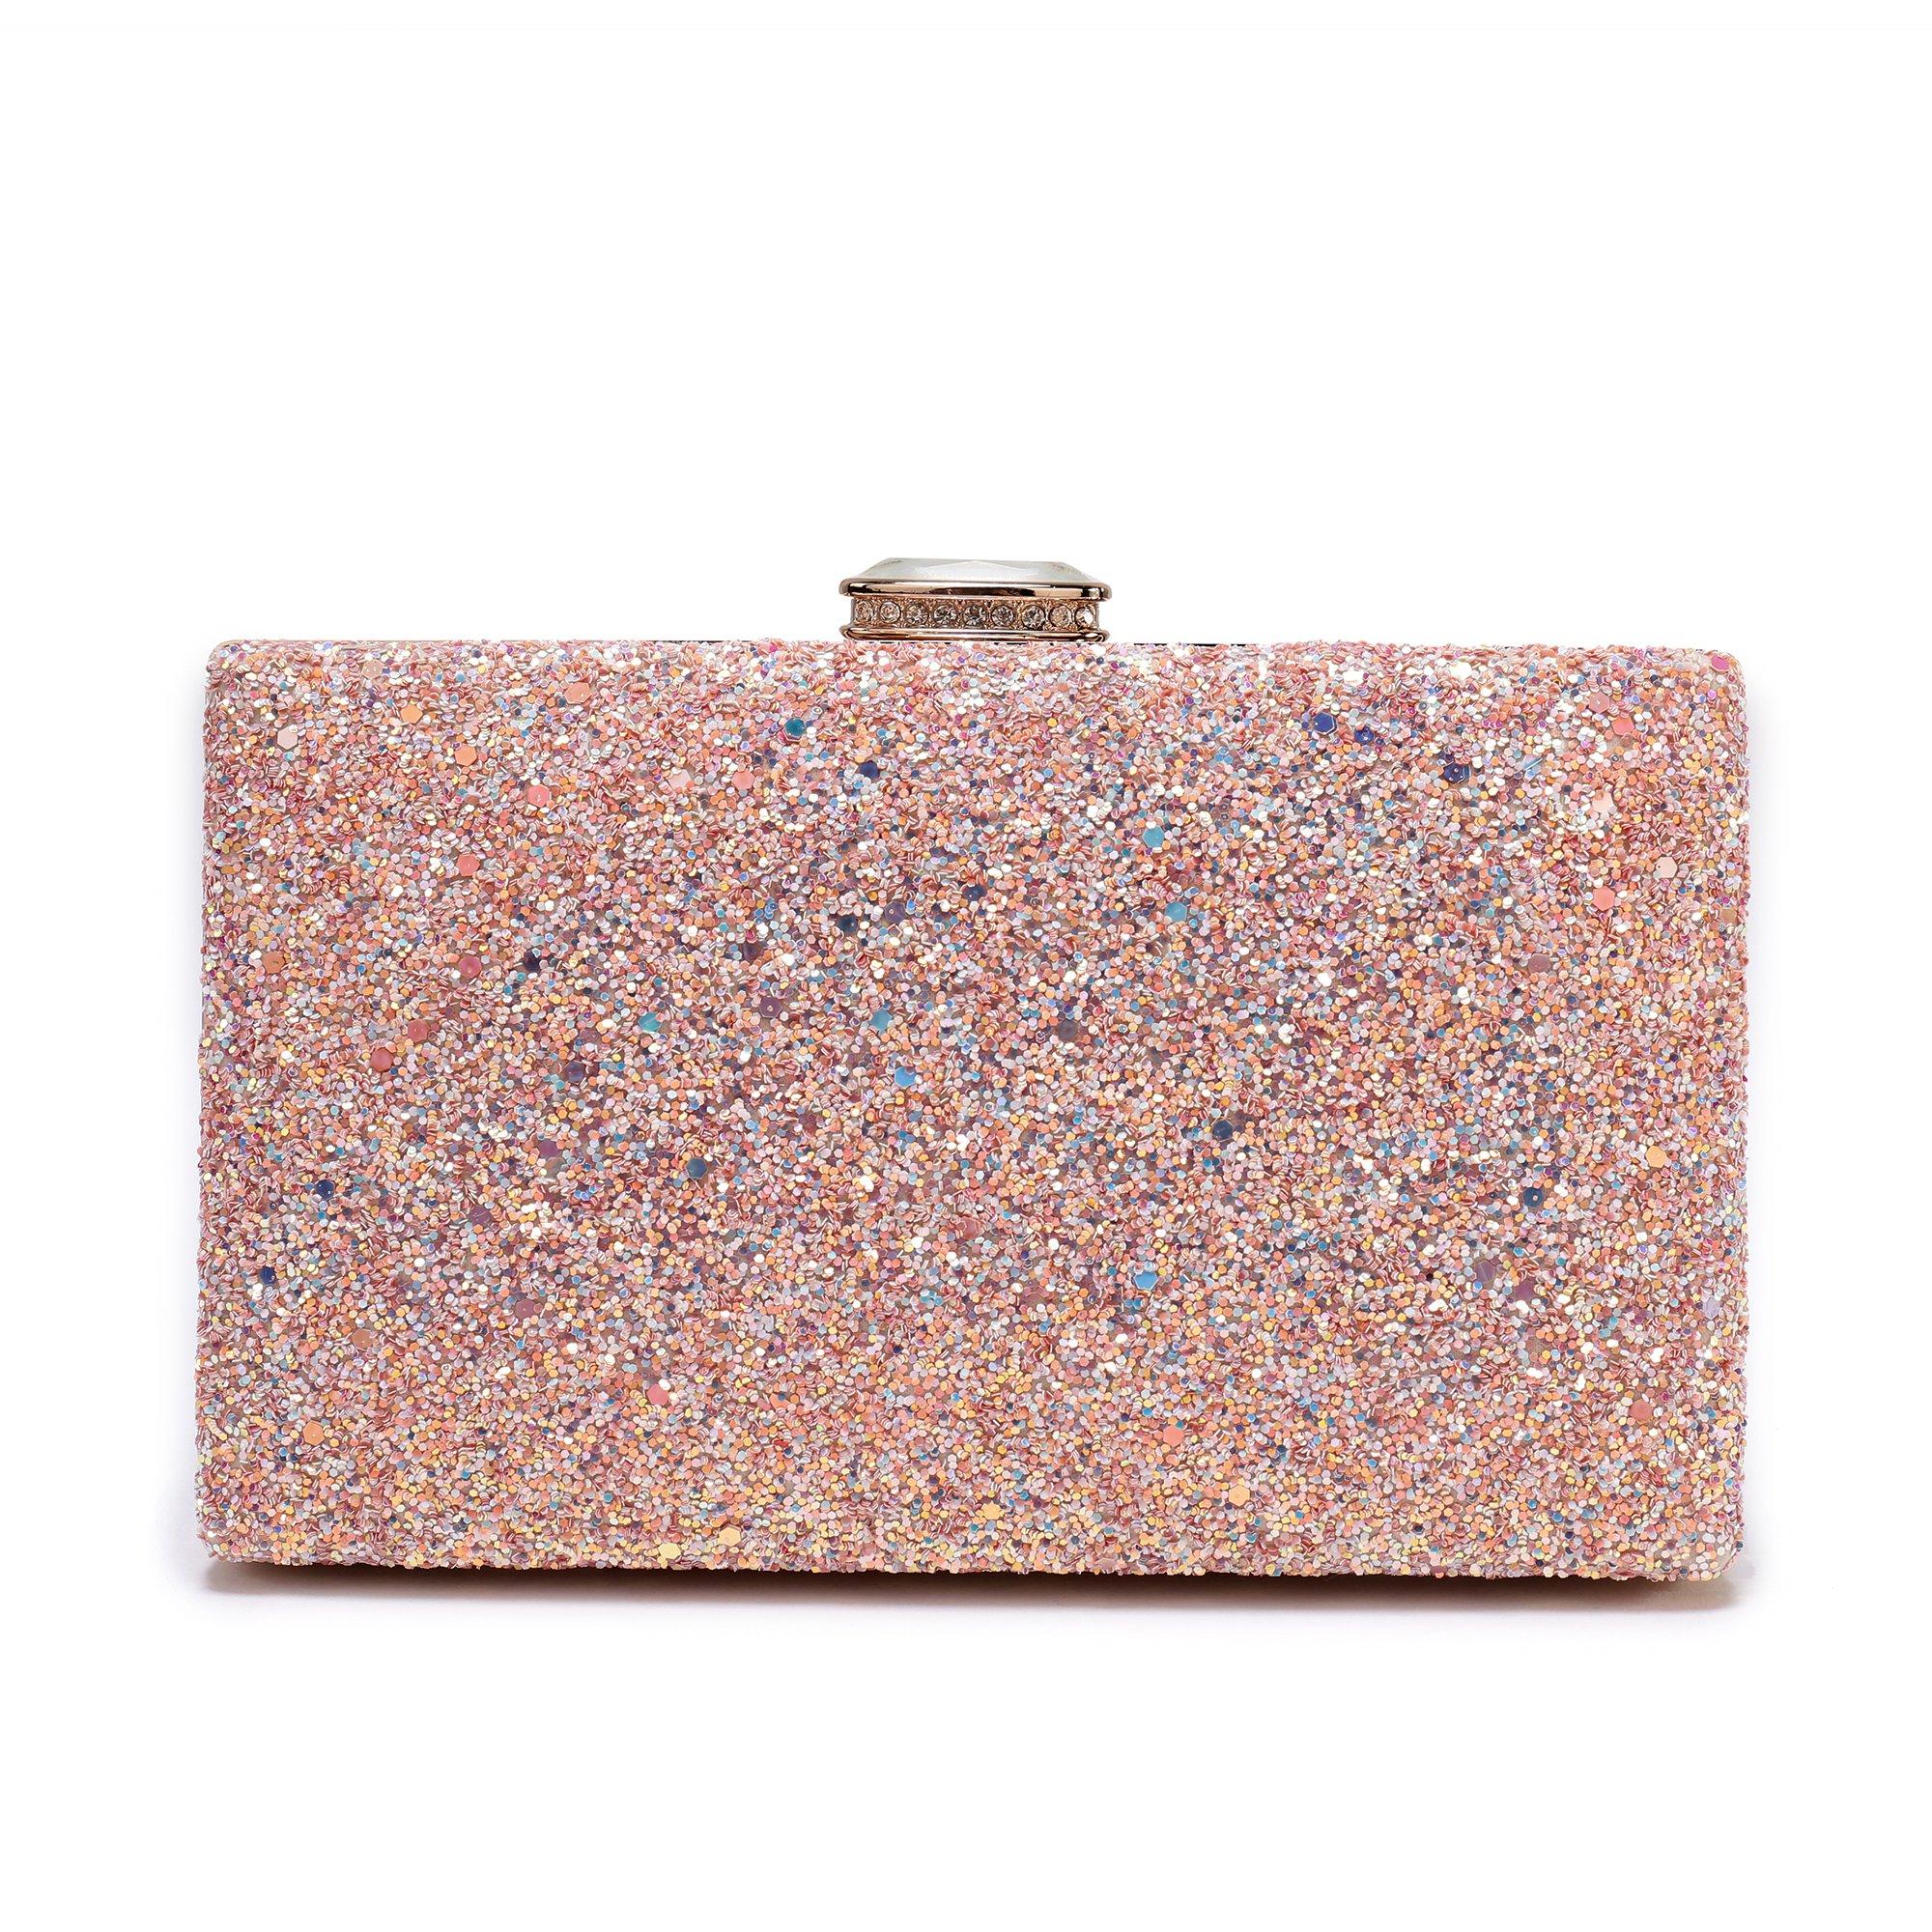 Women's Elegant Sparkling Glitter Evening Clutch Bags BlingEvening Handbag Purses For Wedding Prom Bride(Pink)